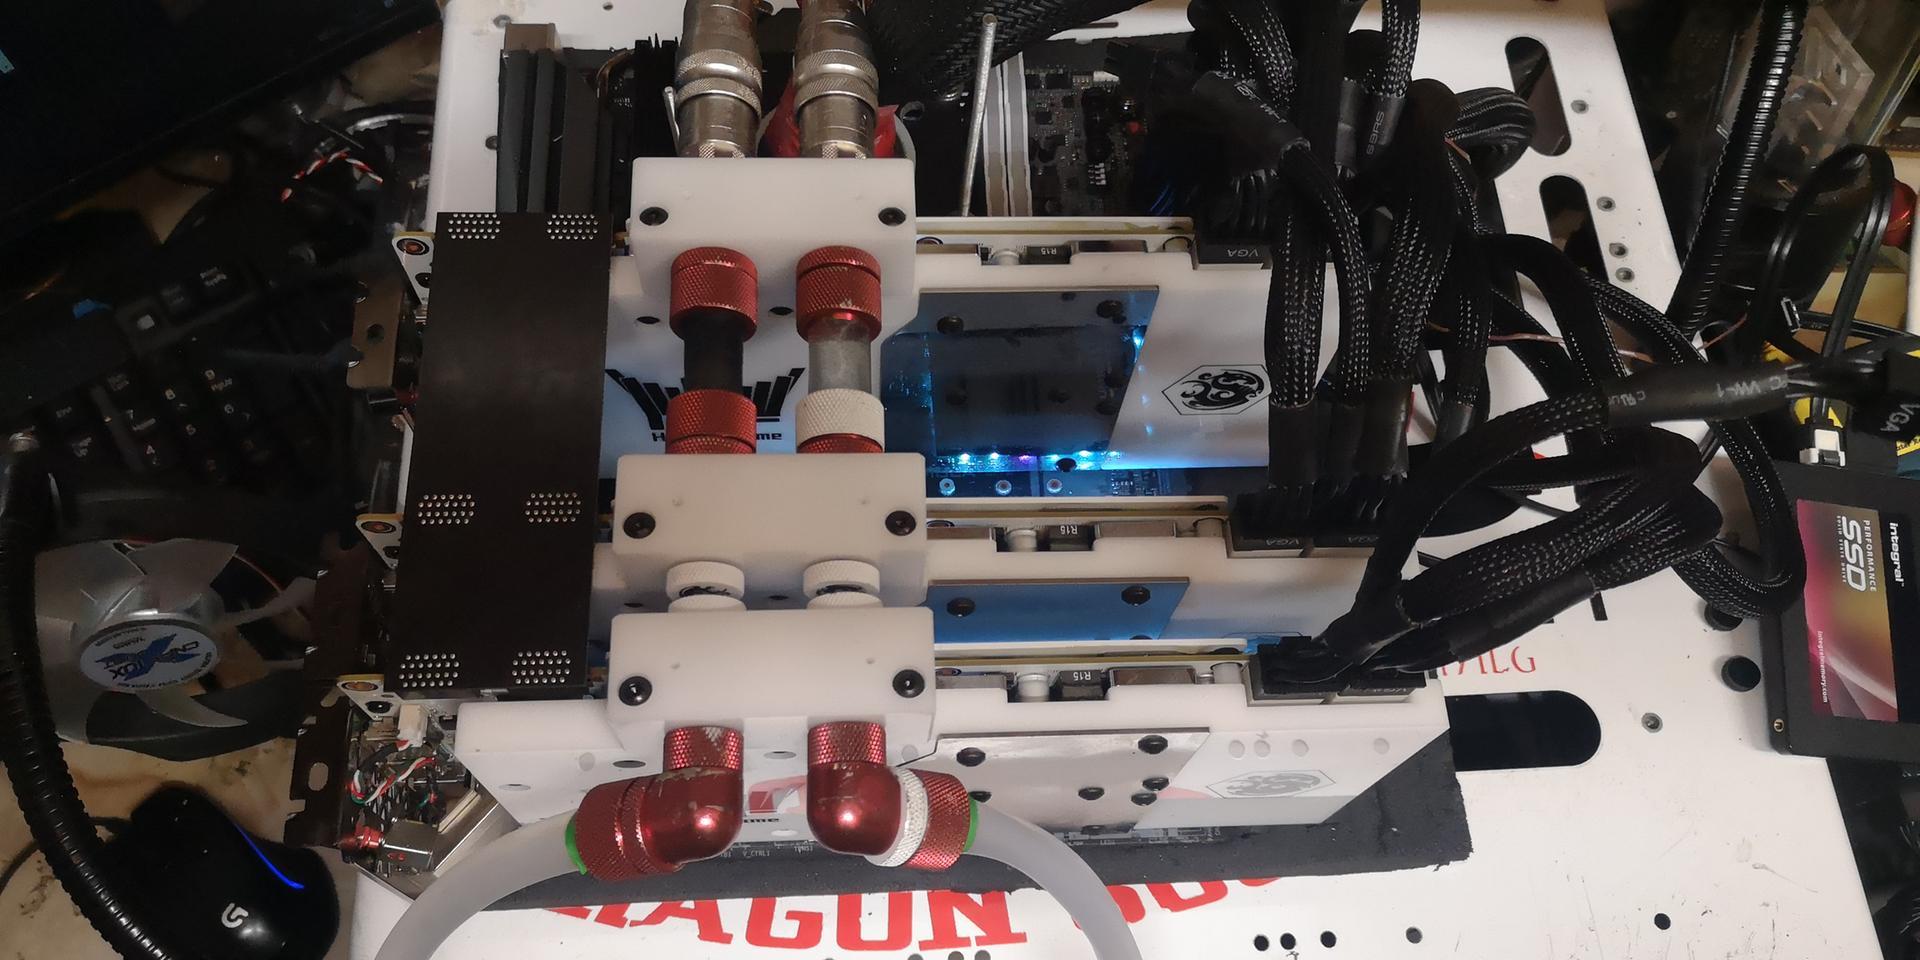 Dragon Soop установил рекорд в модельном зачете трех GeForce GTX 980 Ti